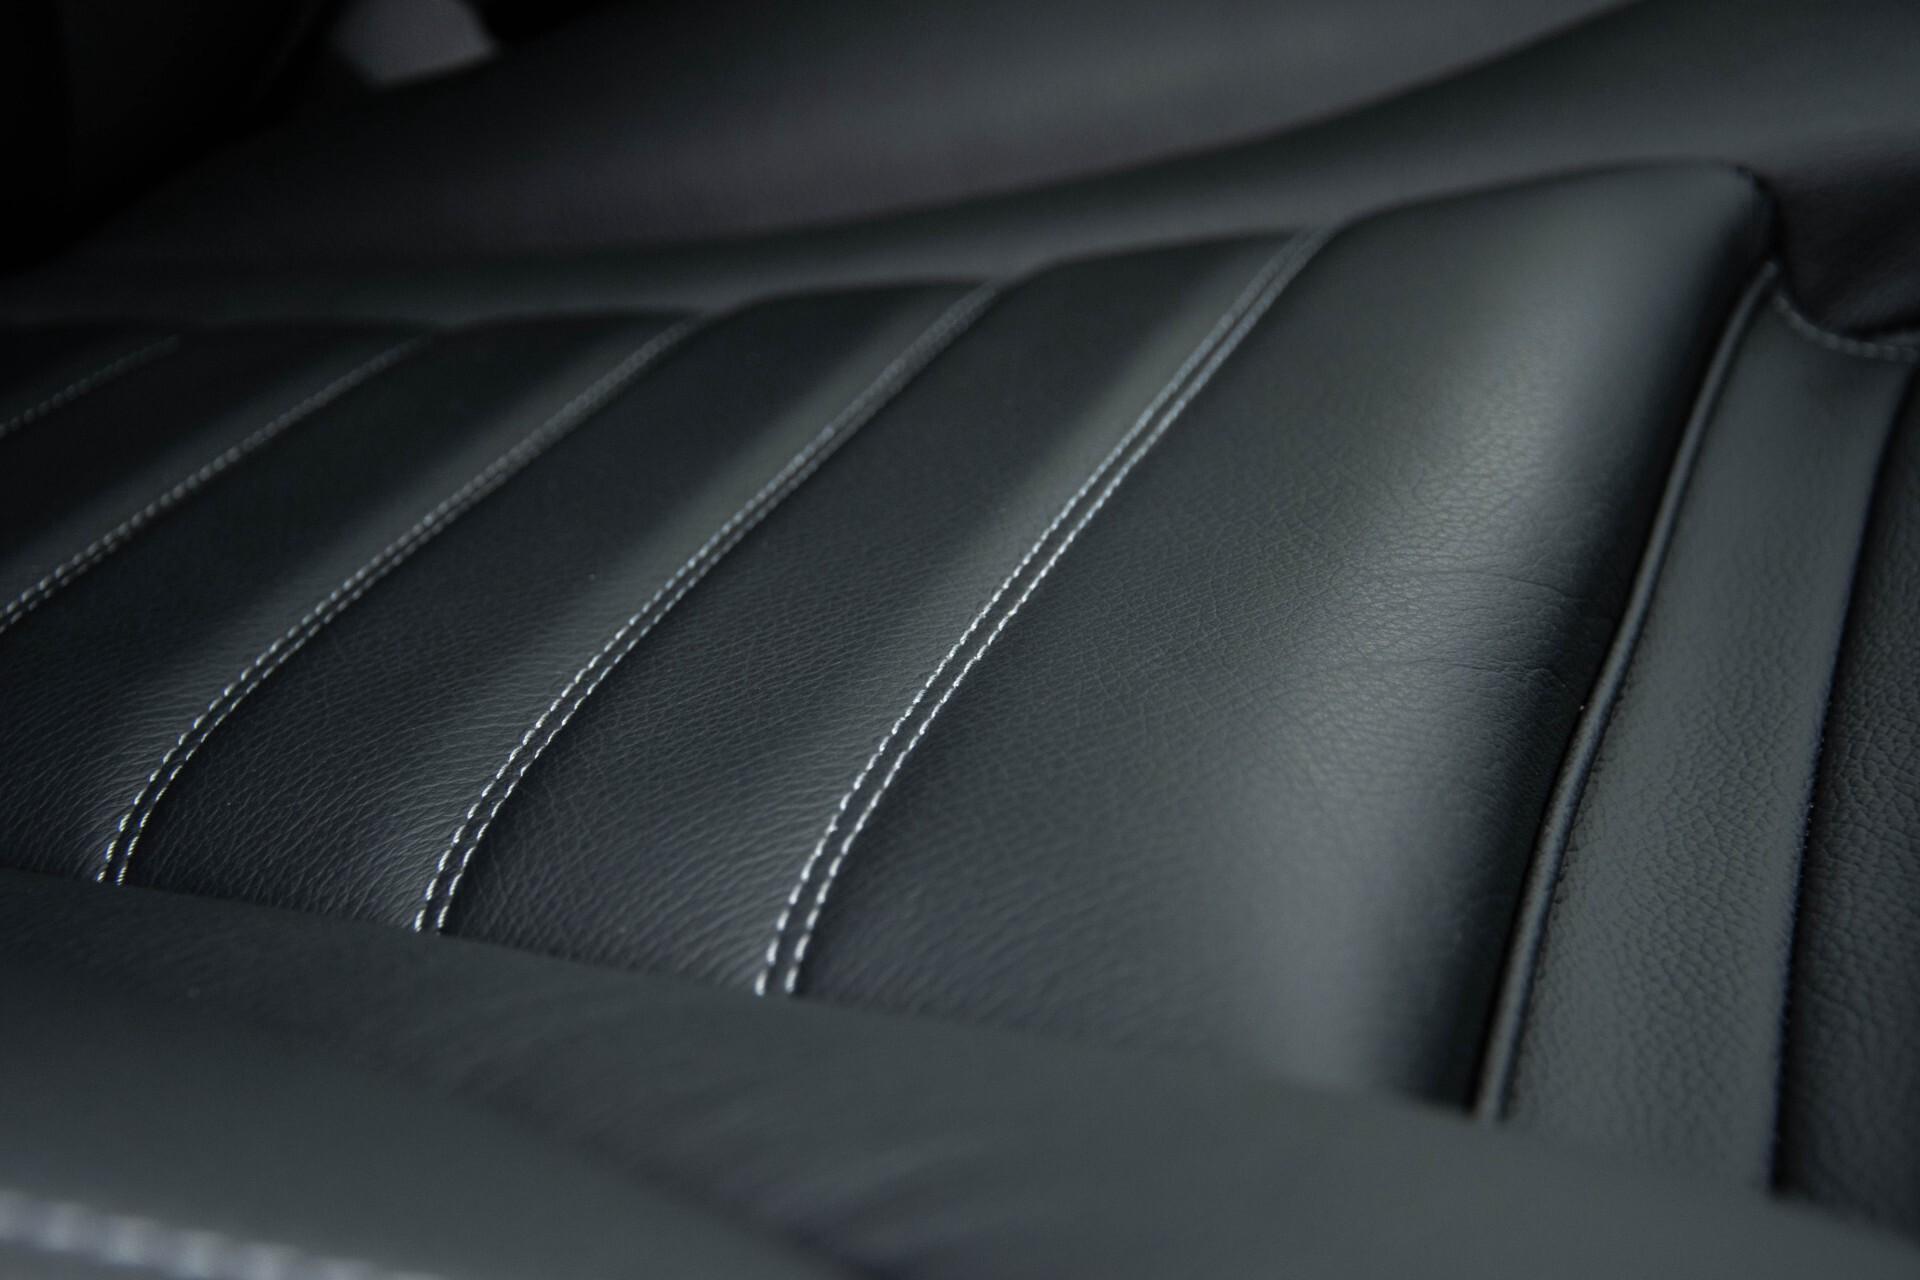 Mercedes-Benz GLC 200 4-M AMG Night/Panorama/Distronic Pro/Burmester/360camera/Exclusive Aut9 Foto 52